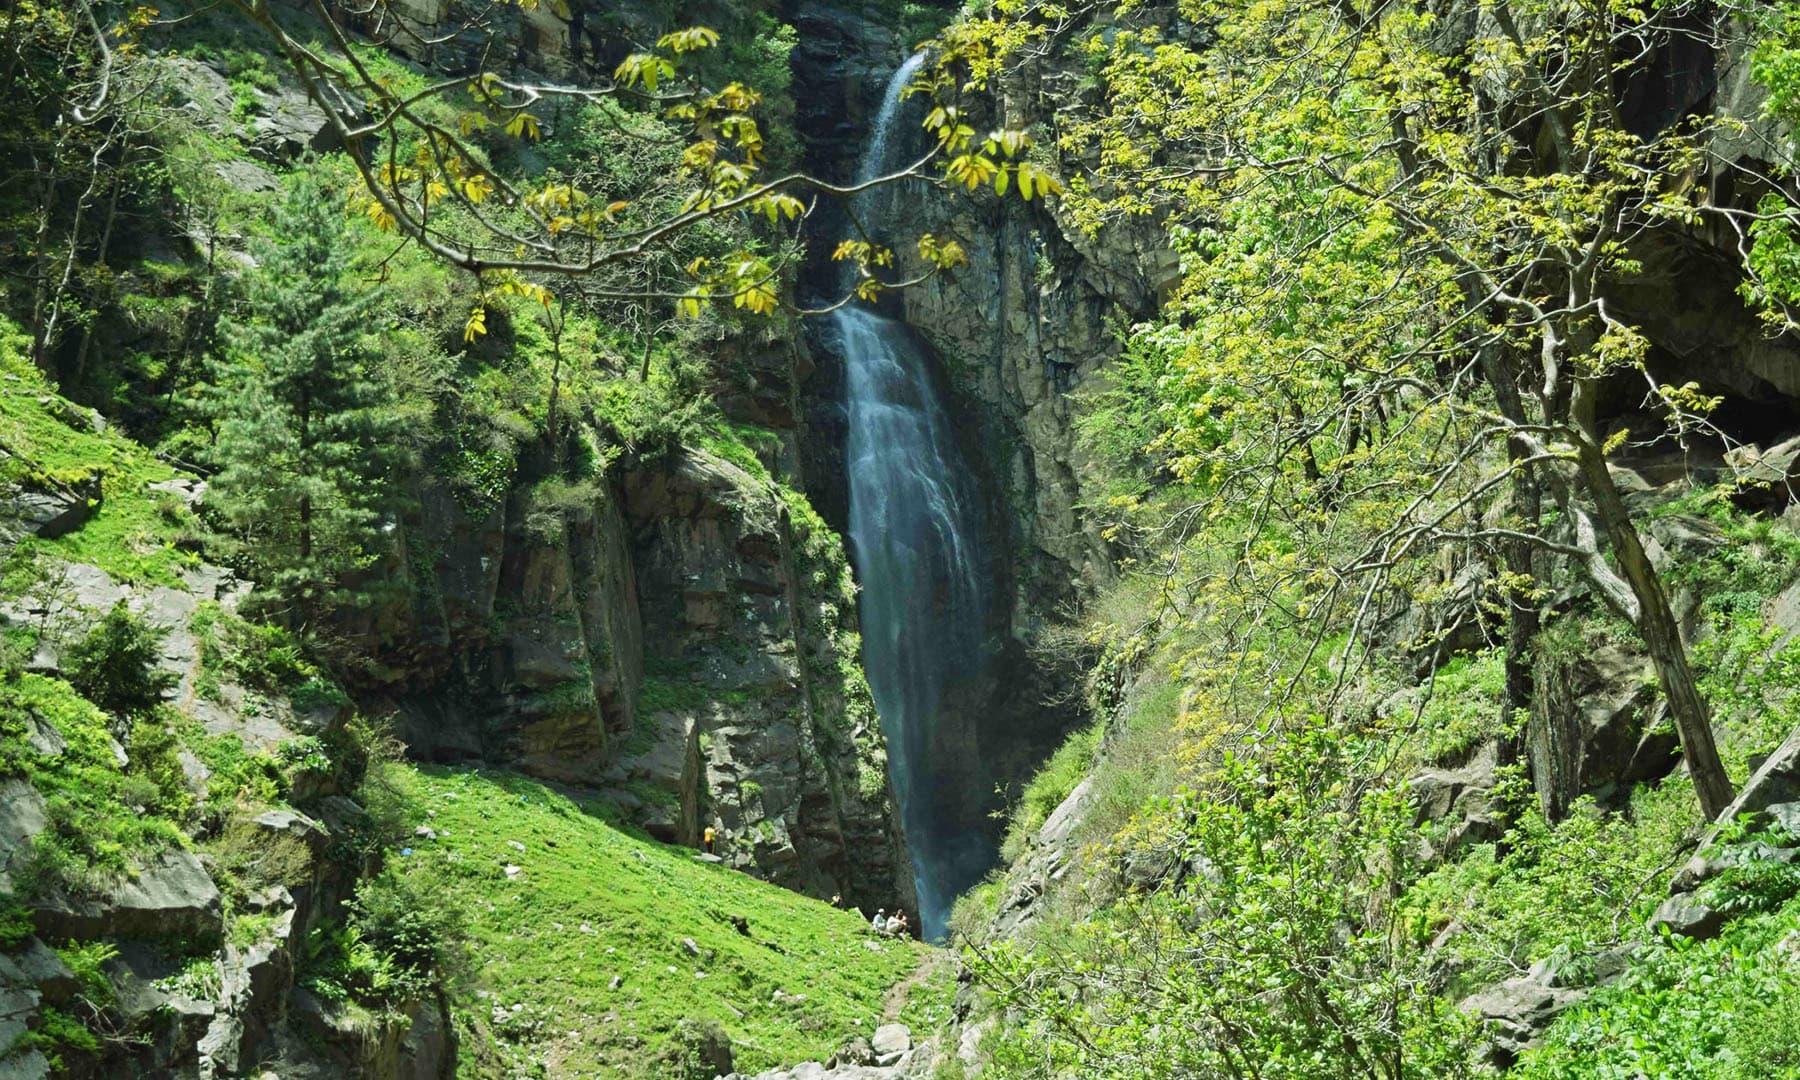 جاروگو کی چھوٹی آبشار— تصویر امجد علی سحاب